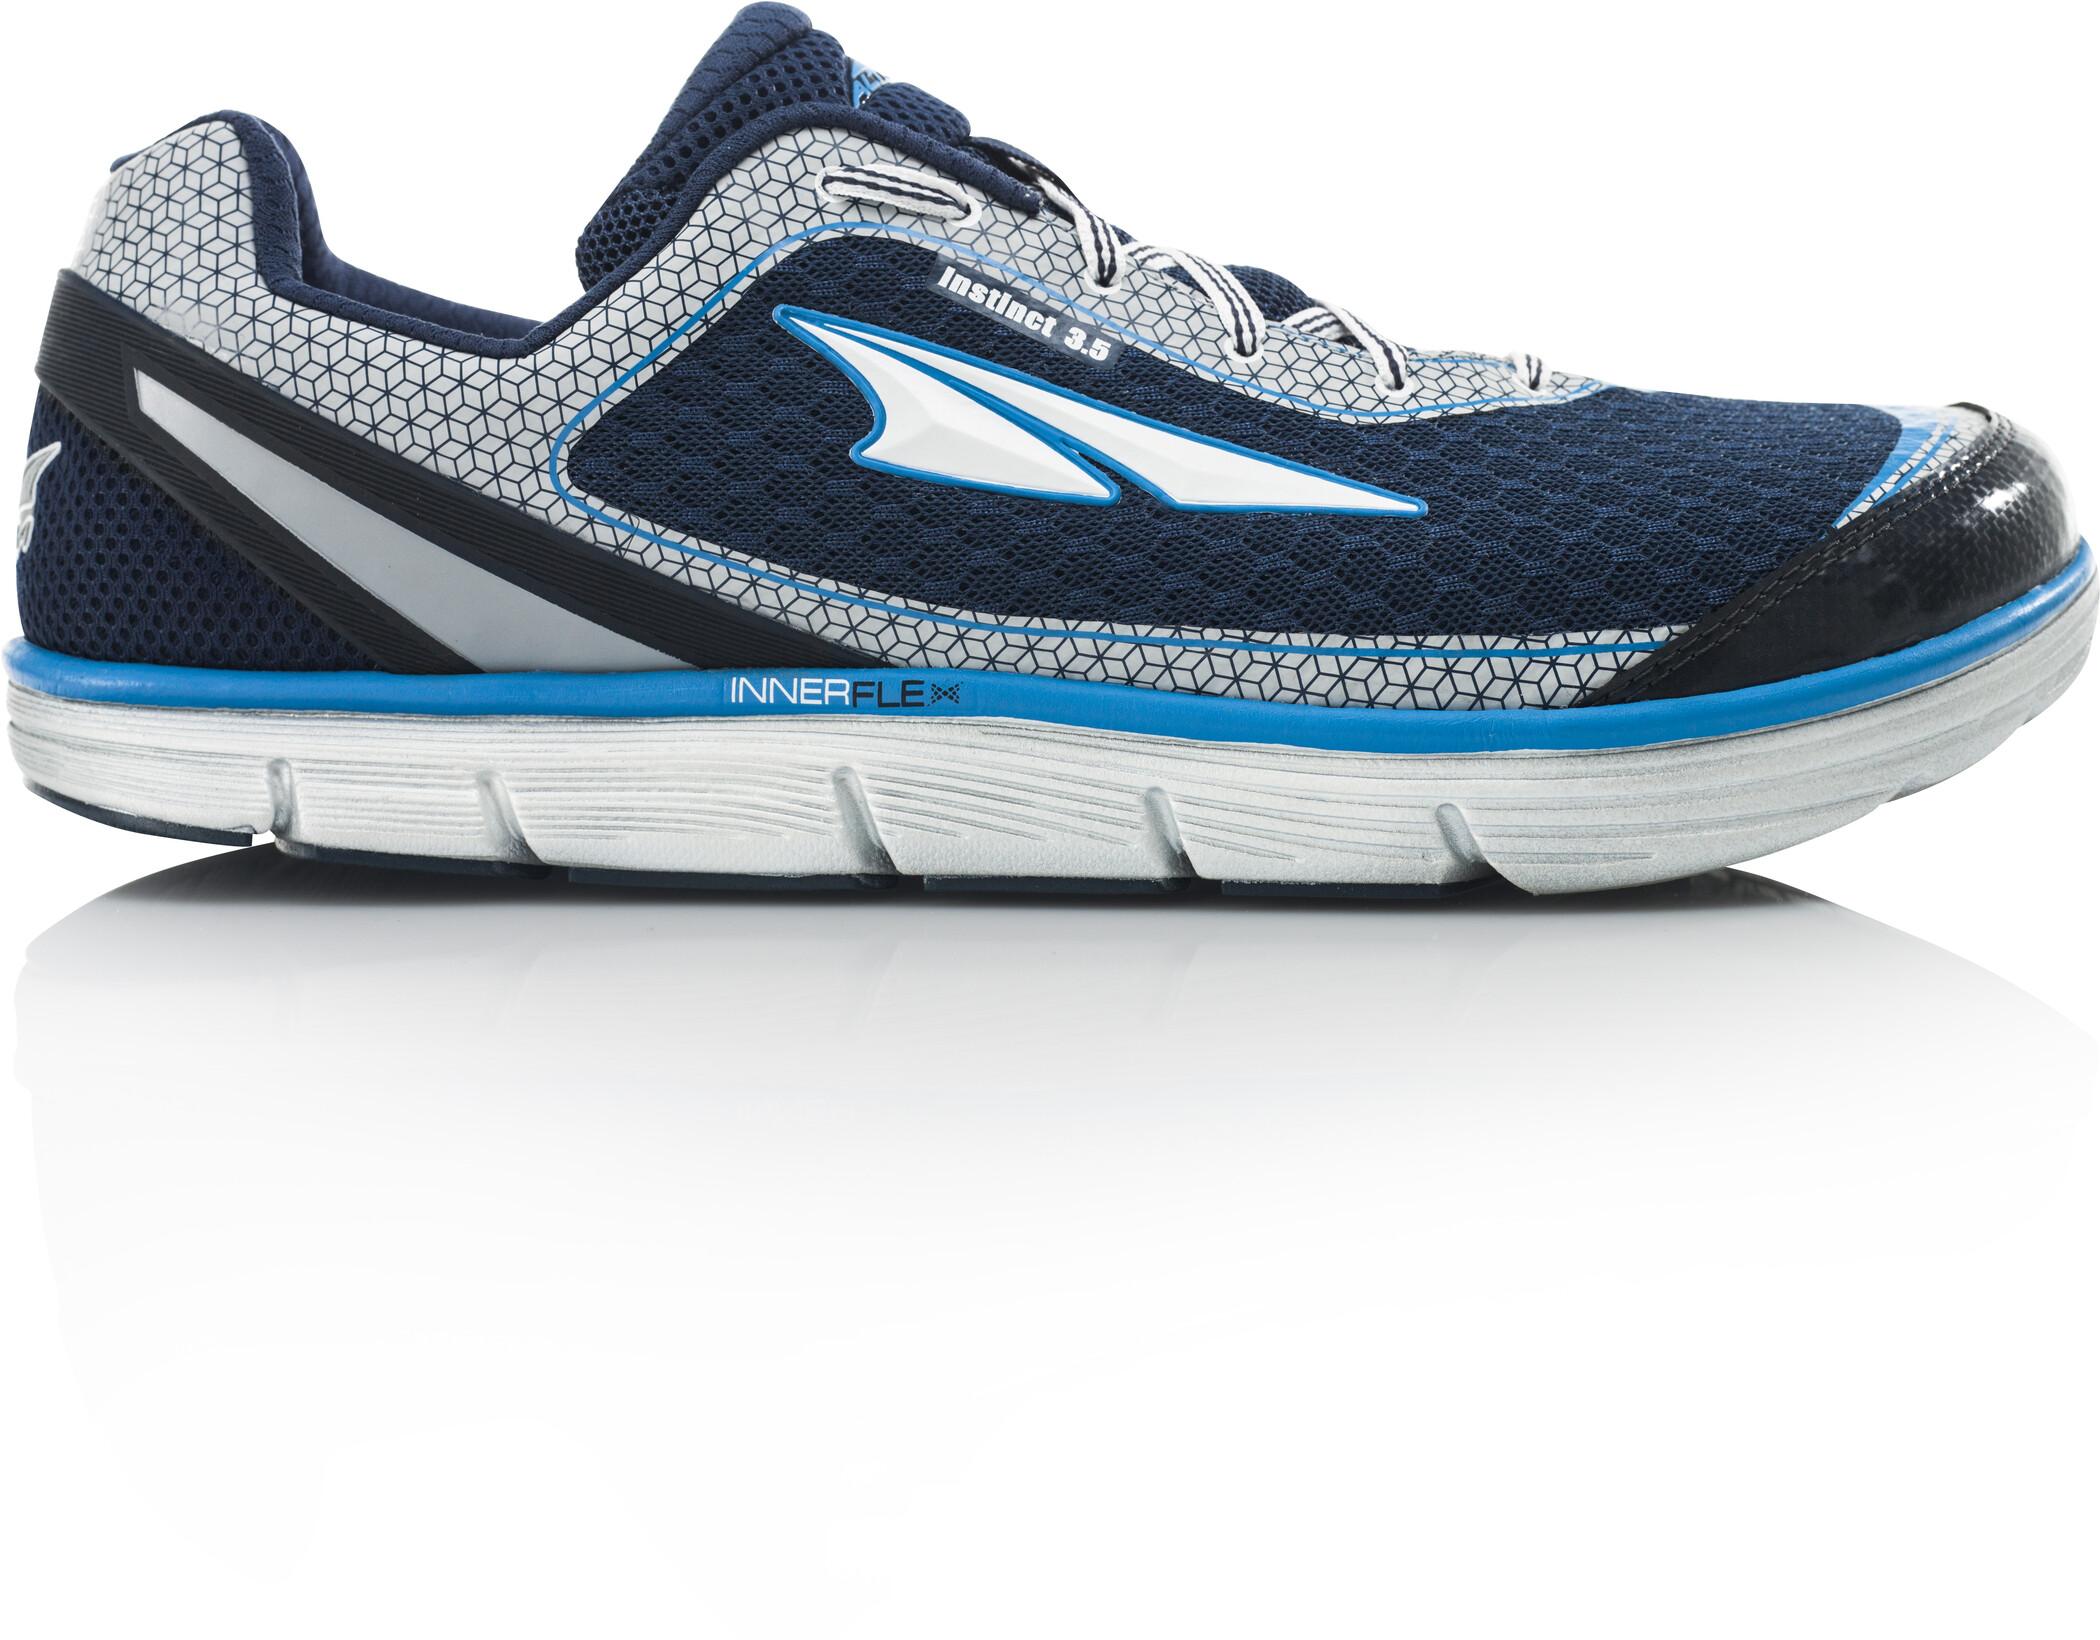 Altra Instinct 3.5 Løbesko Herrer, blue/silver (2019) | Running shoes